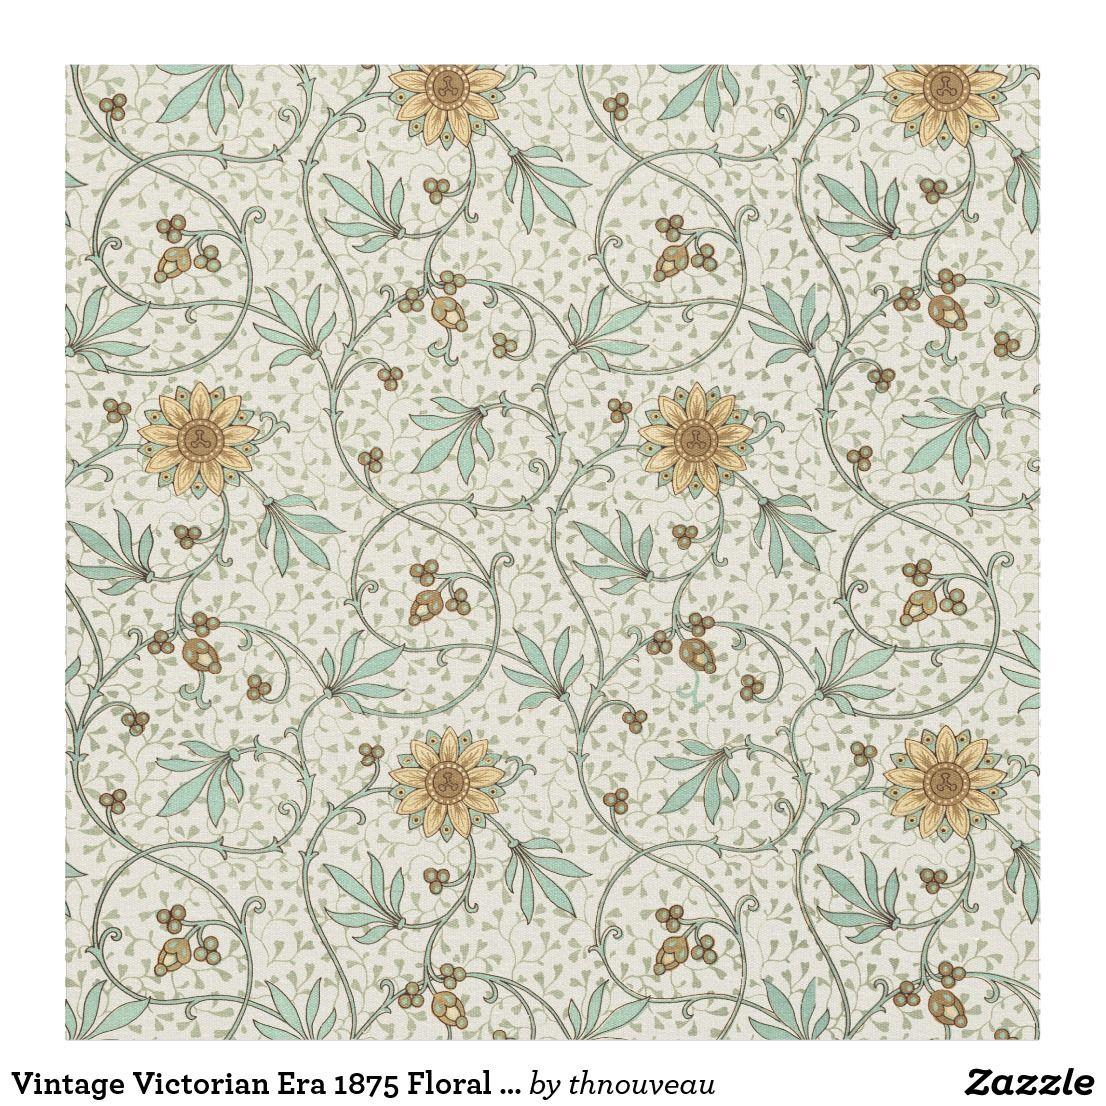 Vintage Victorian Era 1875 Floral Pattern Fabric Vintage